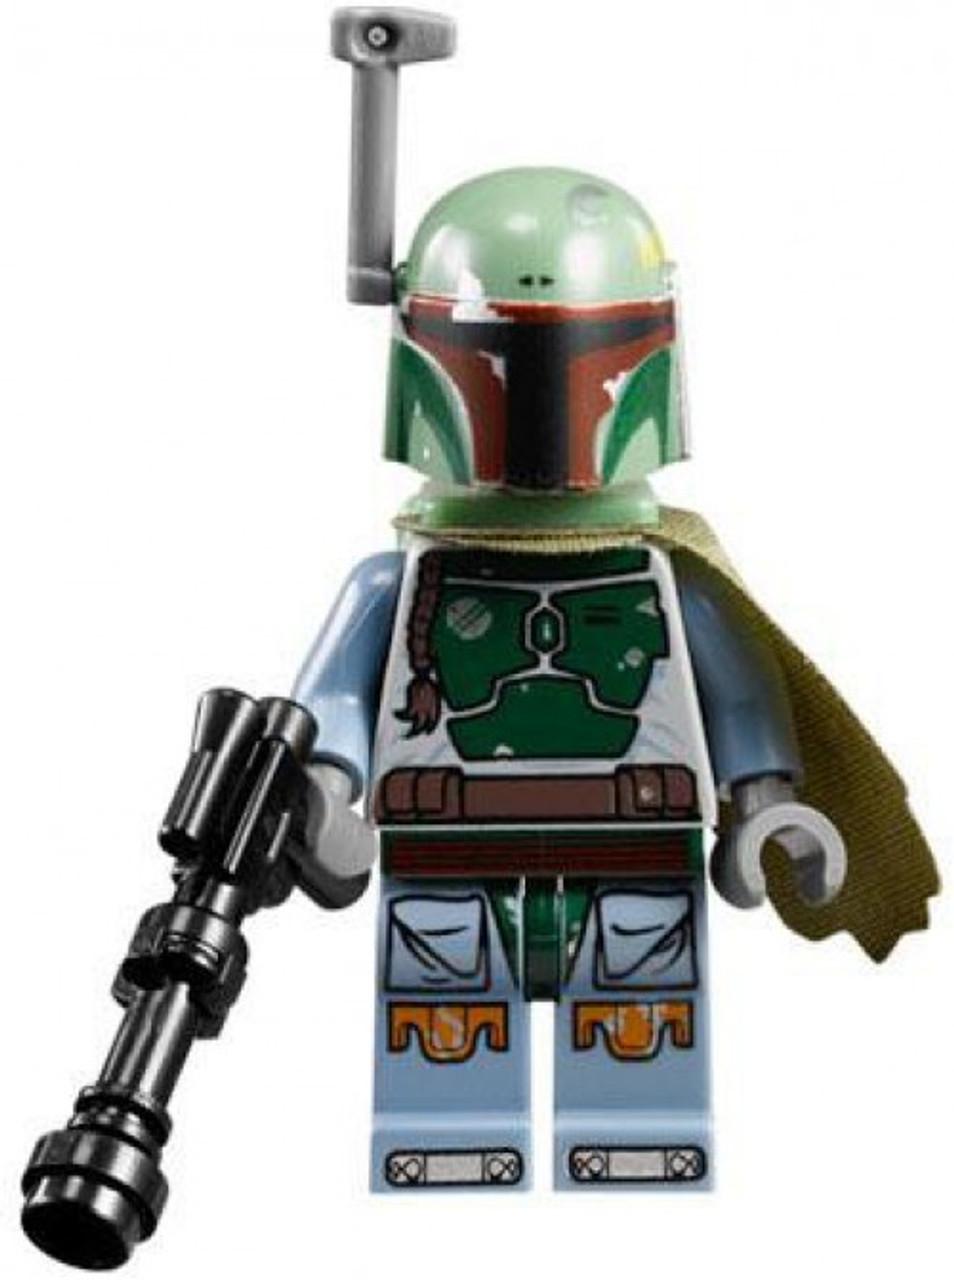 White Boba Fett and Luke Skywalker exclusive minifigures LEGO Star Wars